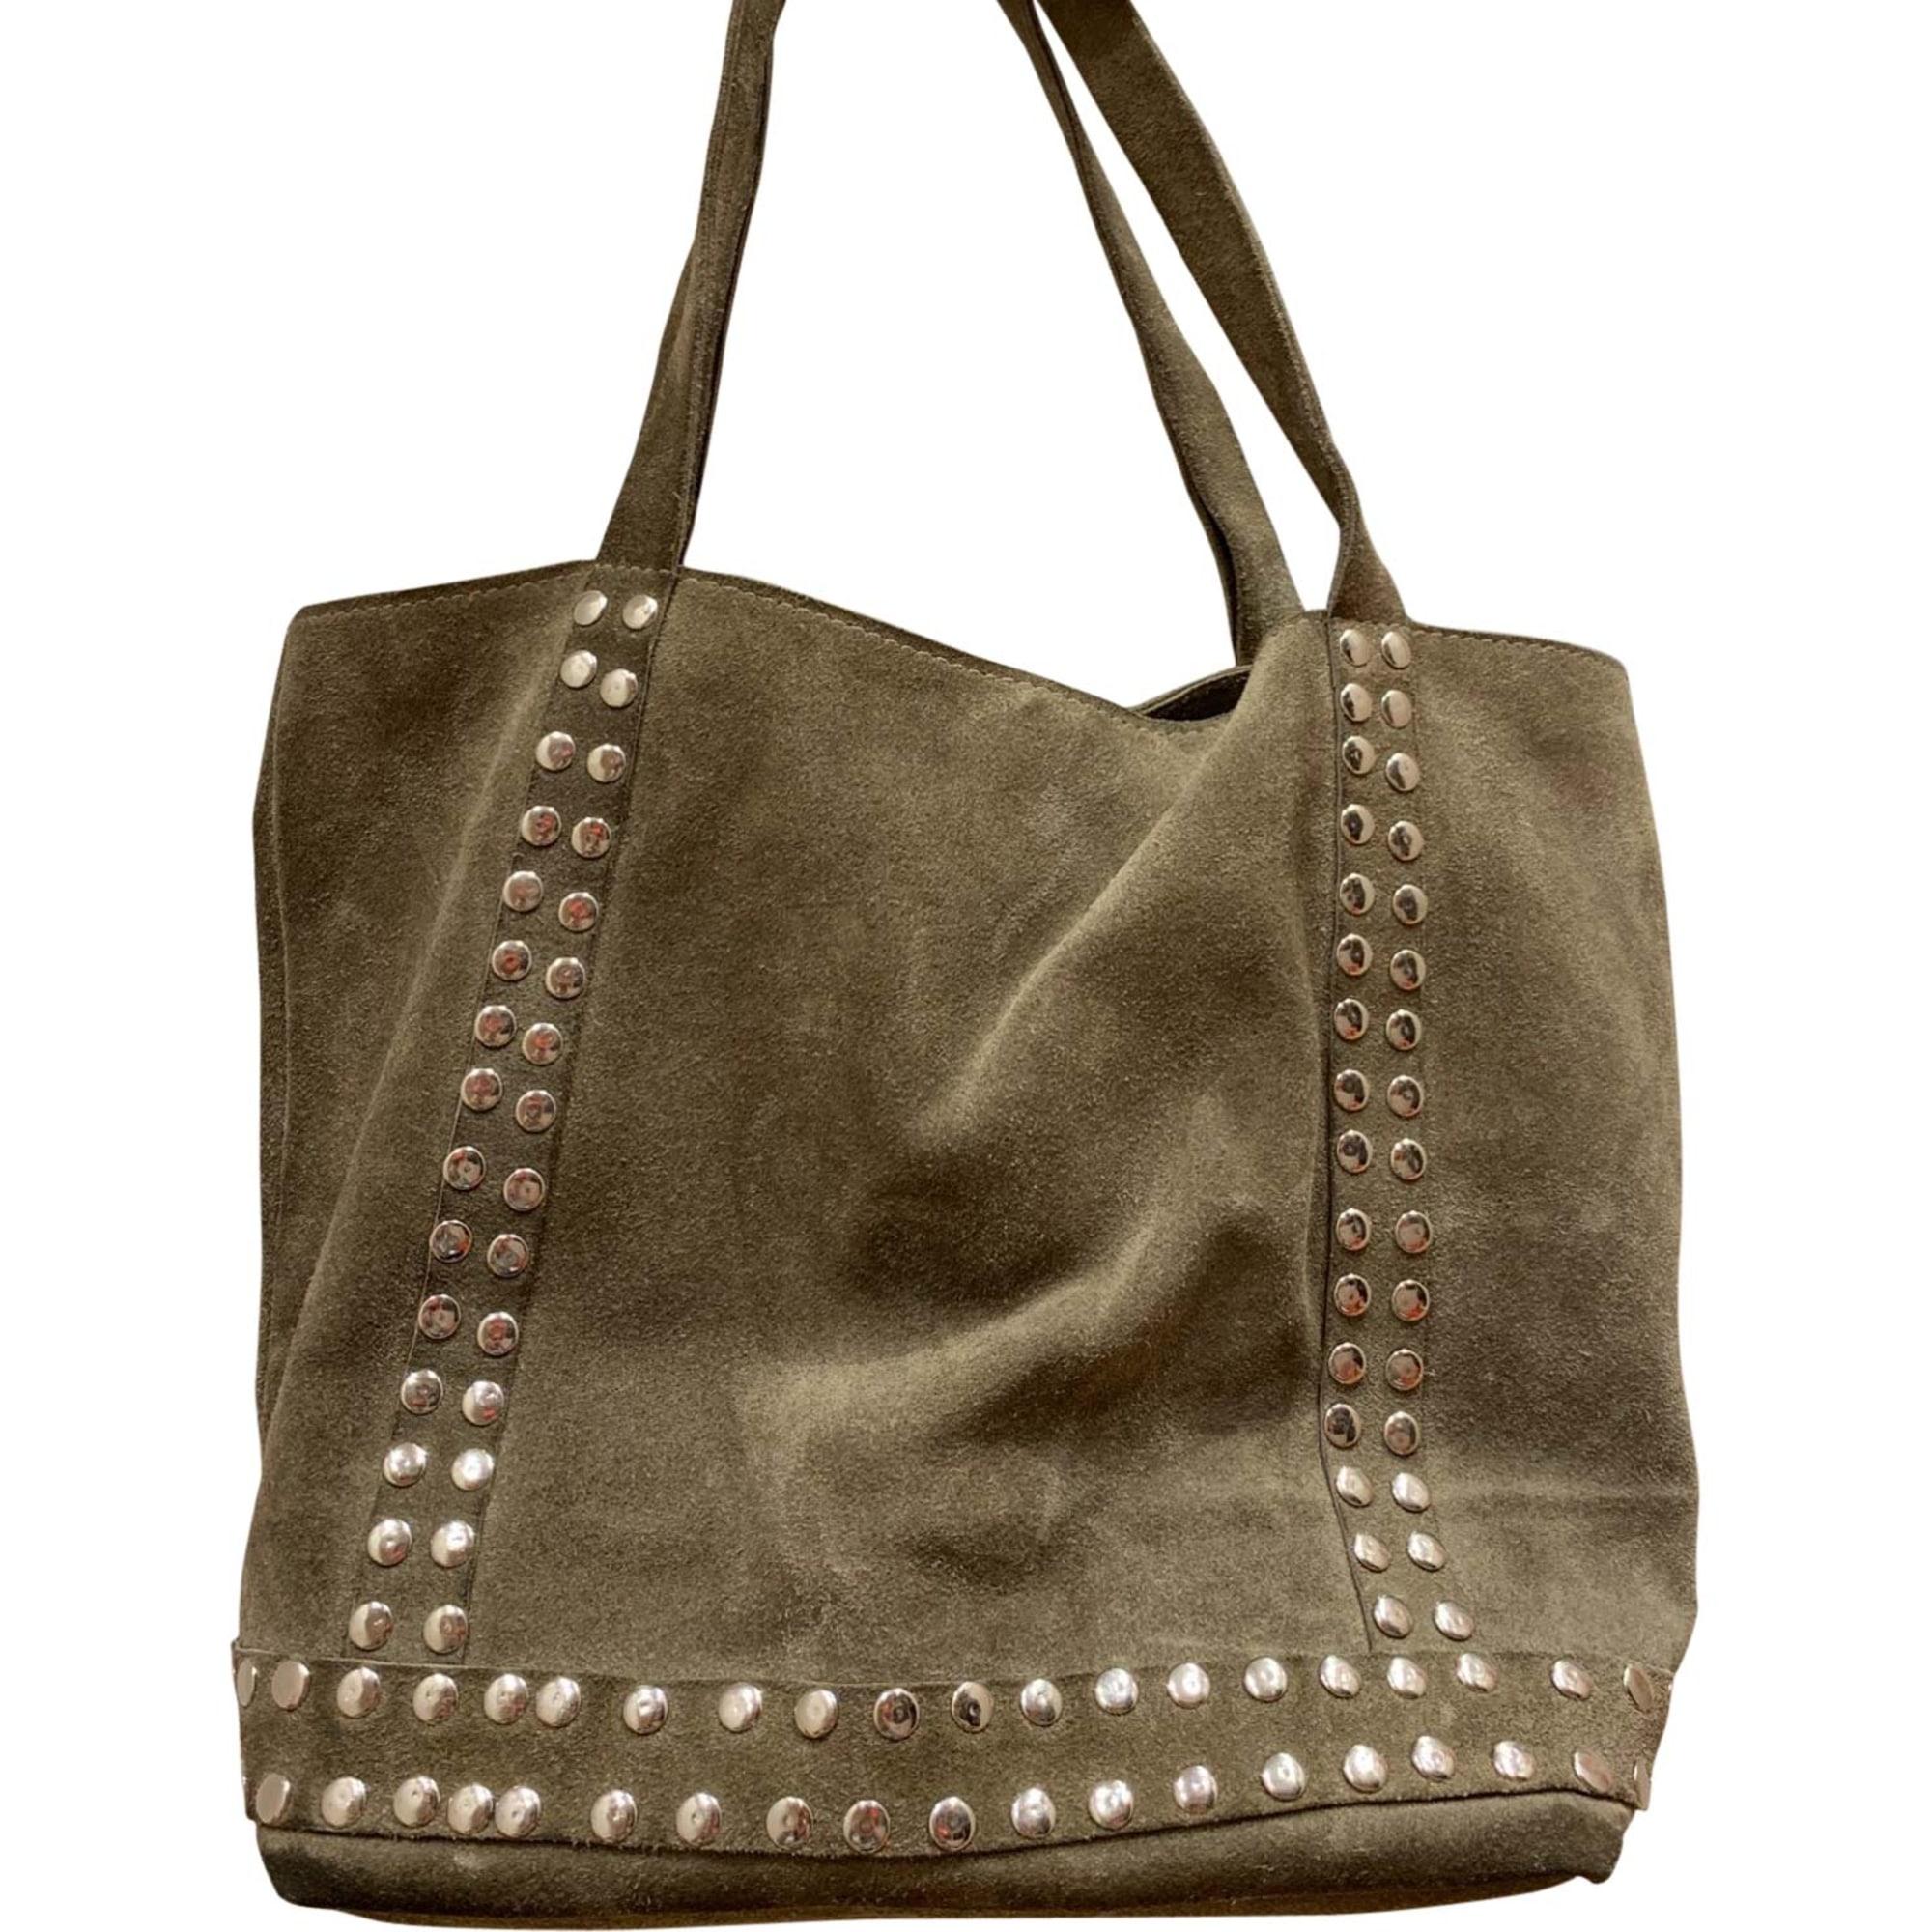 Leather Handbag VANESSA BRUNO Khaki